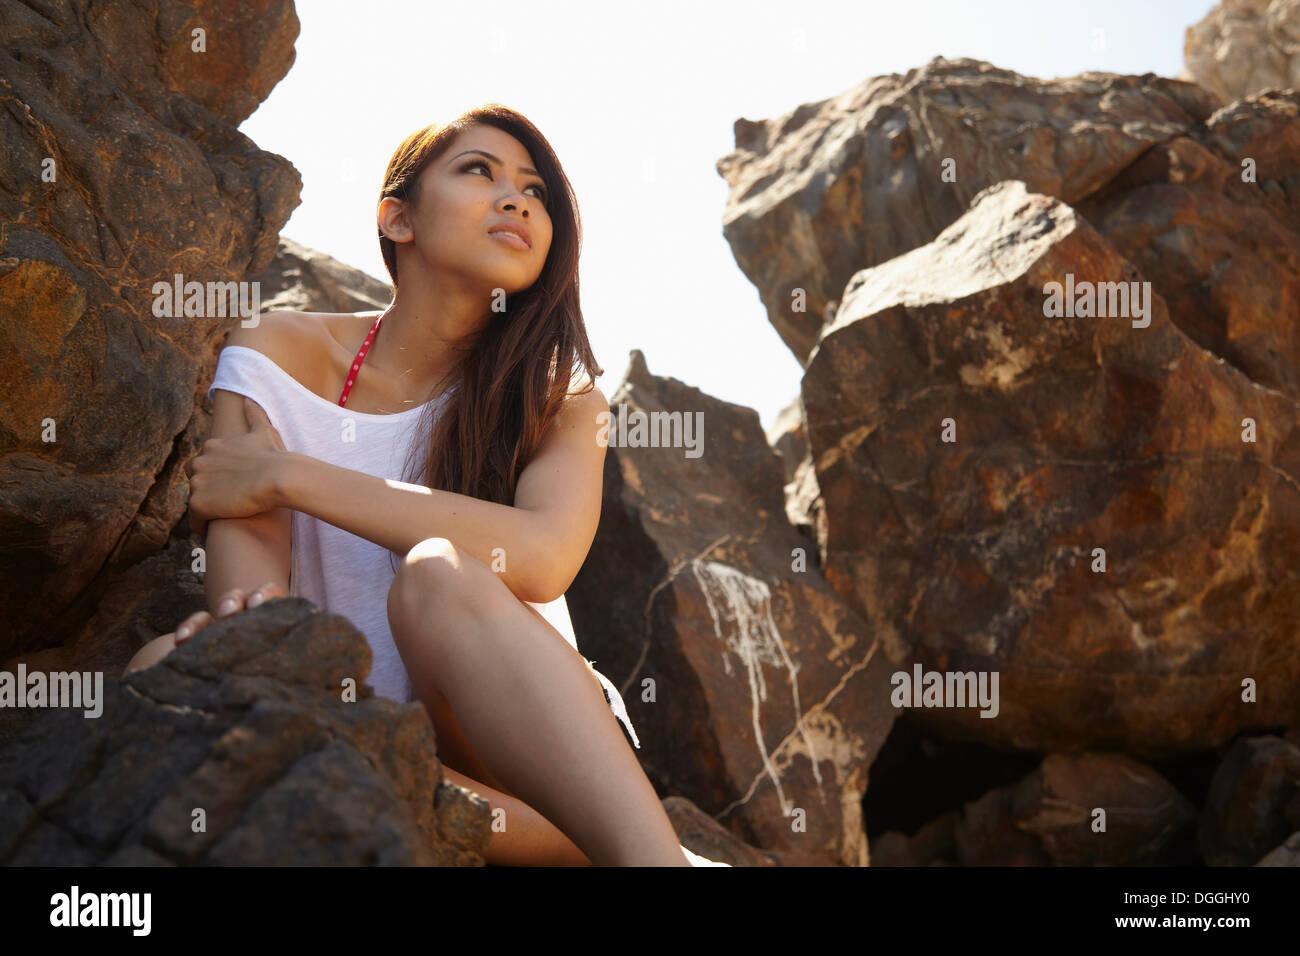 Junge Frau in felsigen Schatten, Palos Verdes, Kalifornien, USA Stockbild